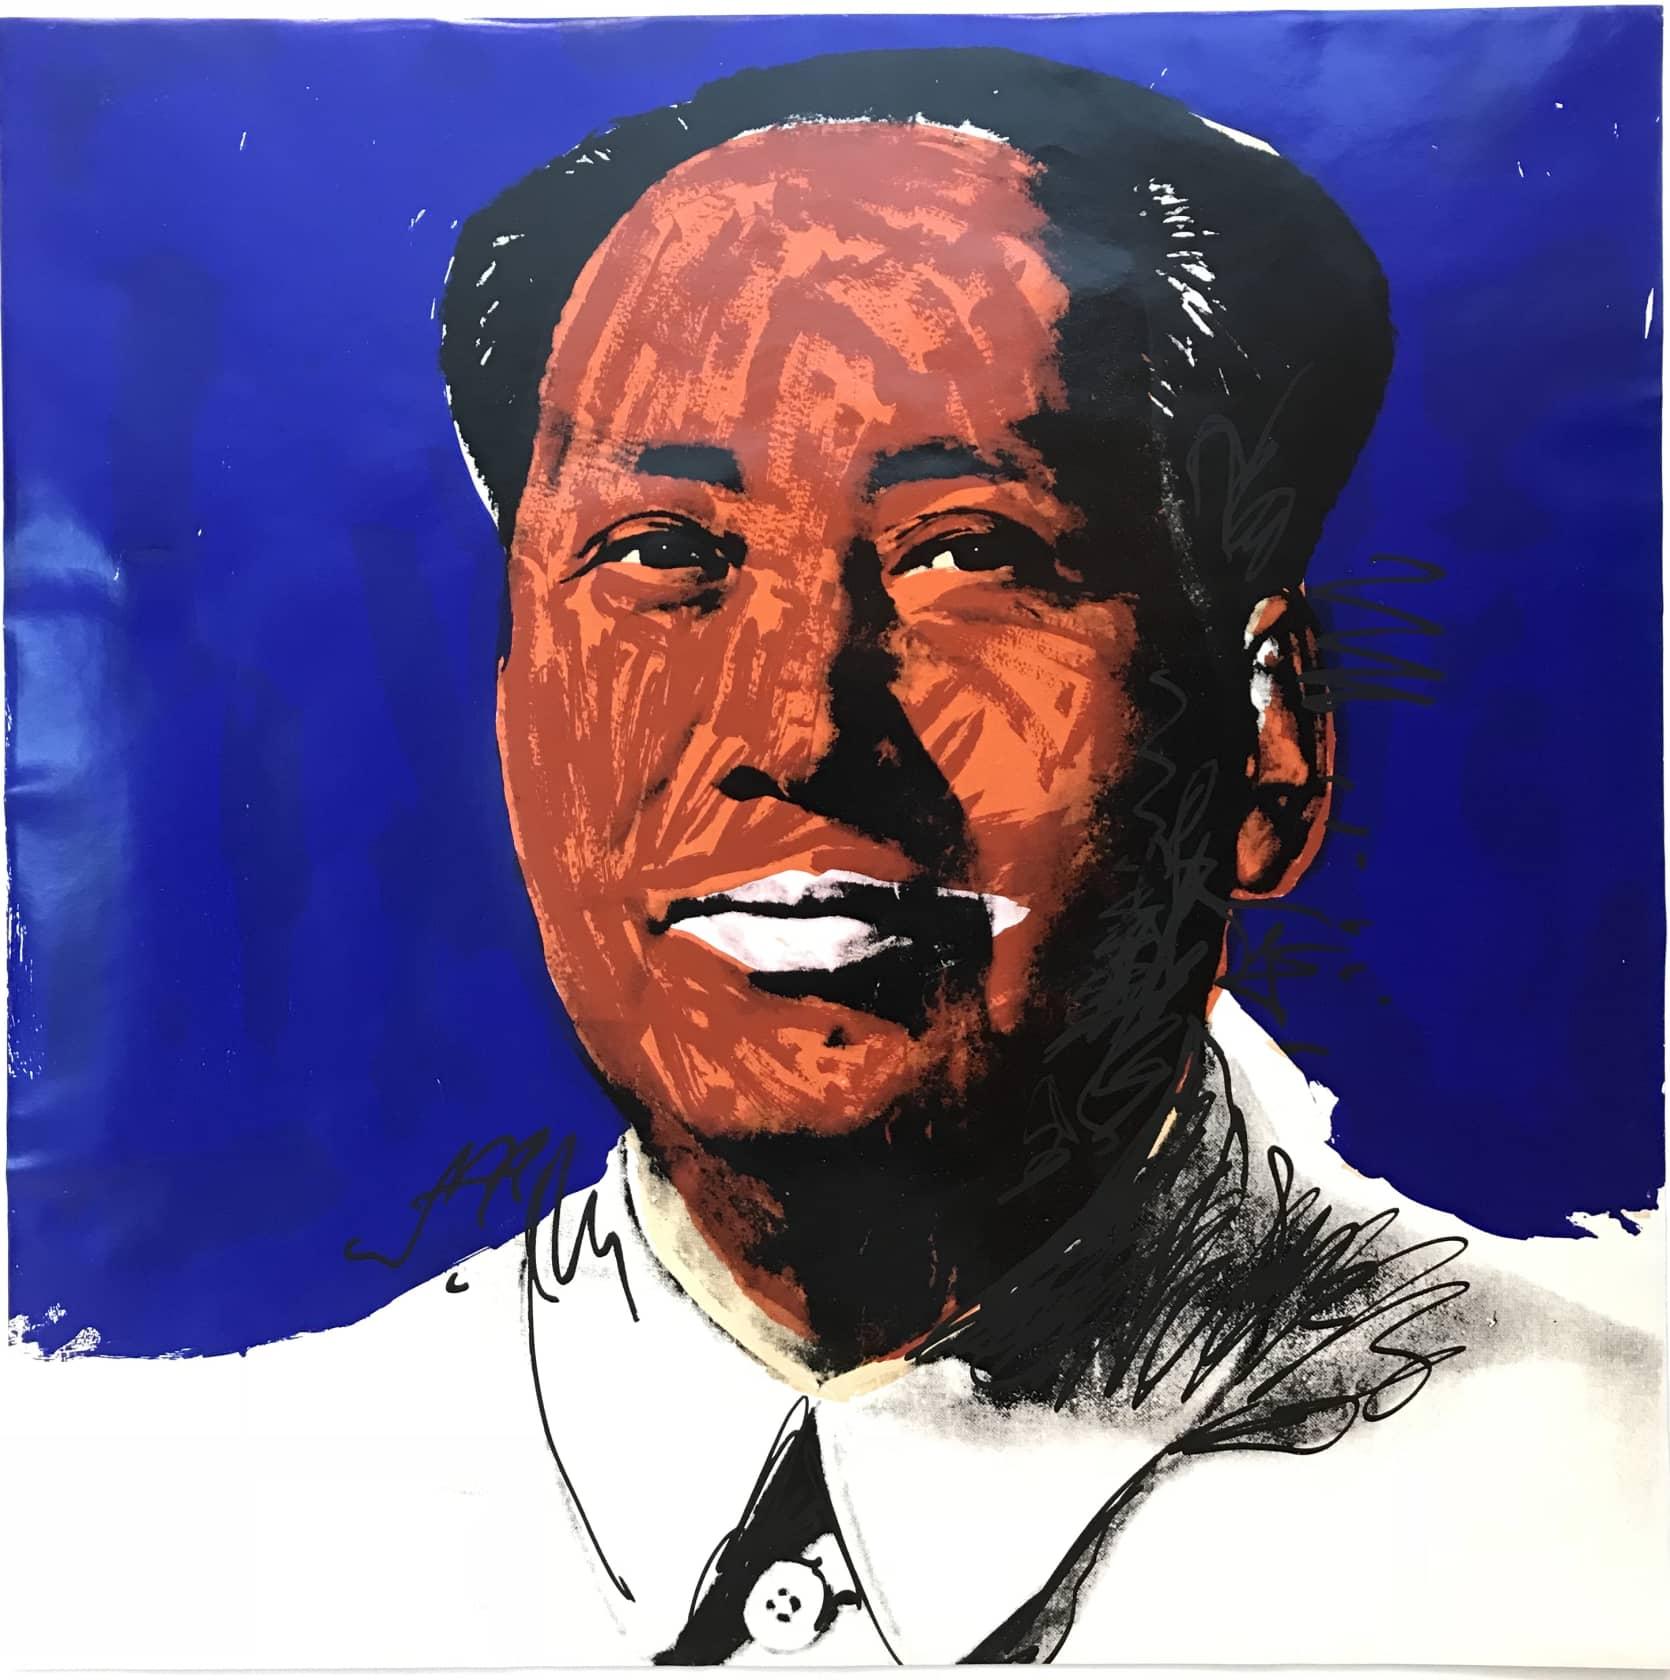 Andy Warhol Mao F&S II.98 Screenprint